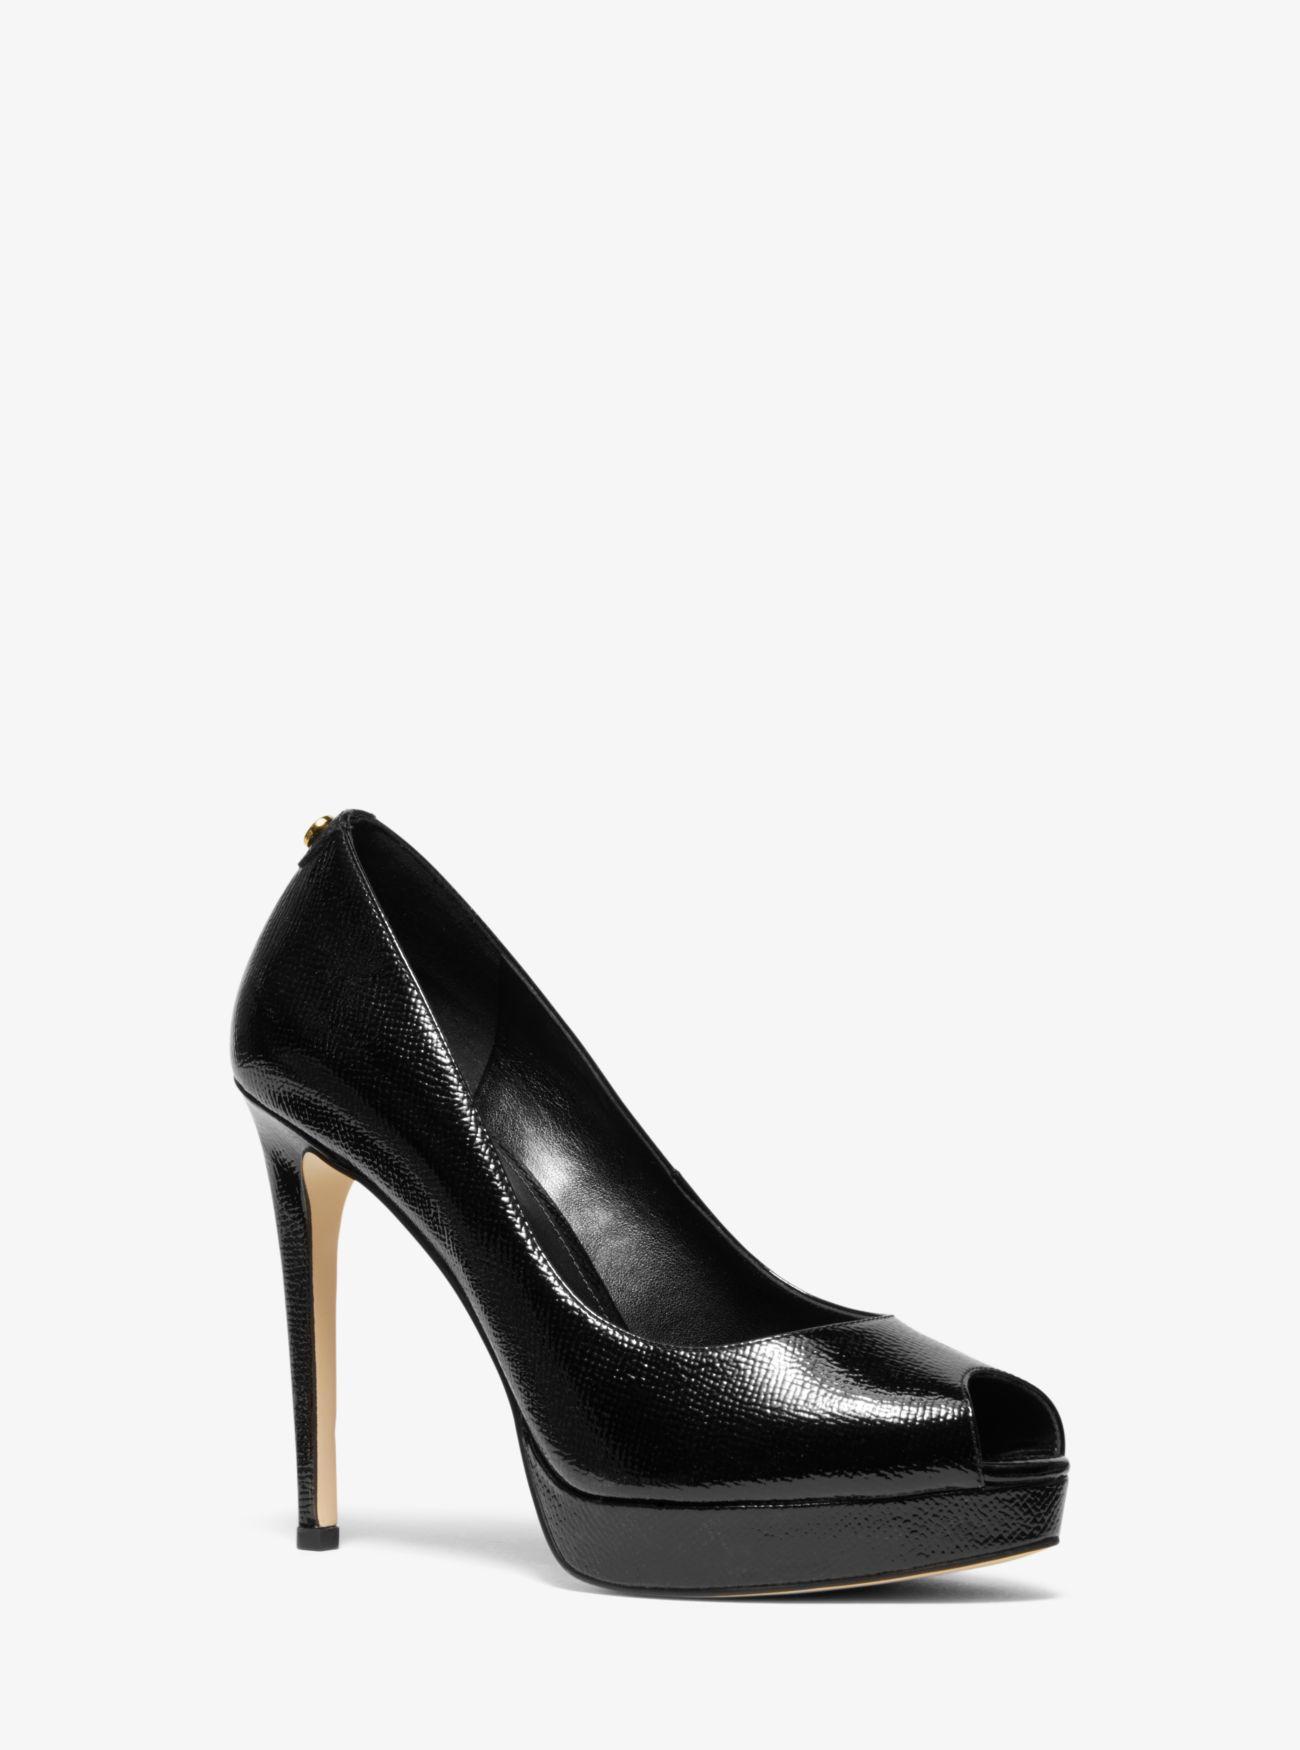 96c1b38490f0 Lyst - Michael Kors Erika Patent Leather Open-toe Pump in Black